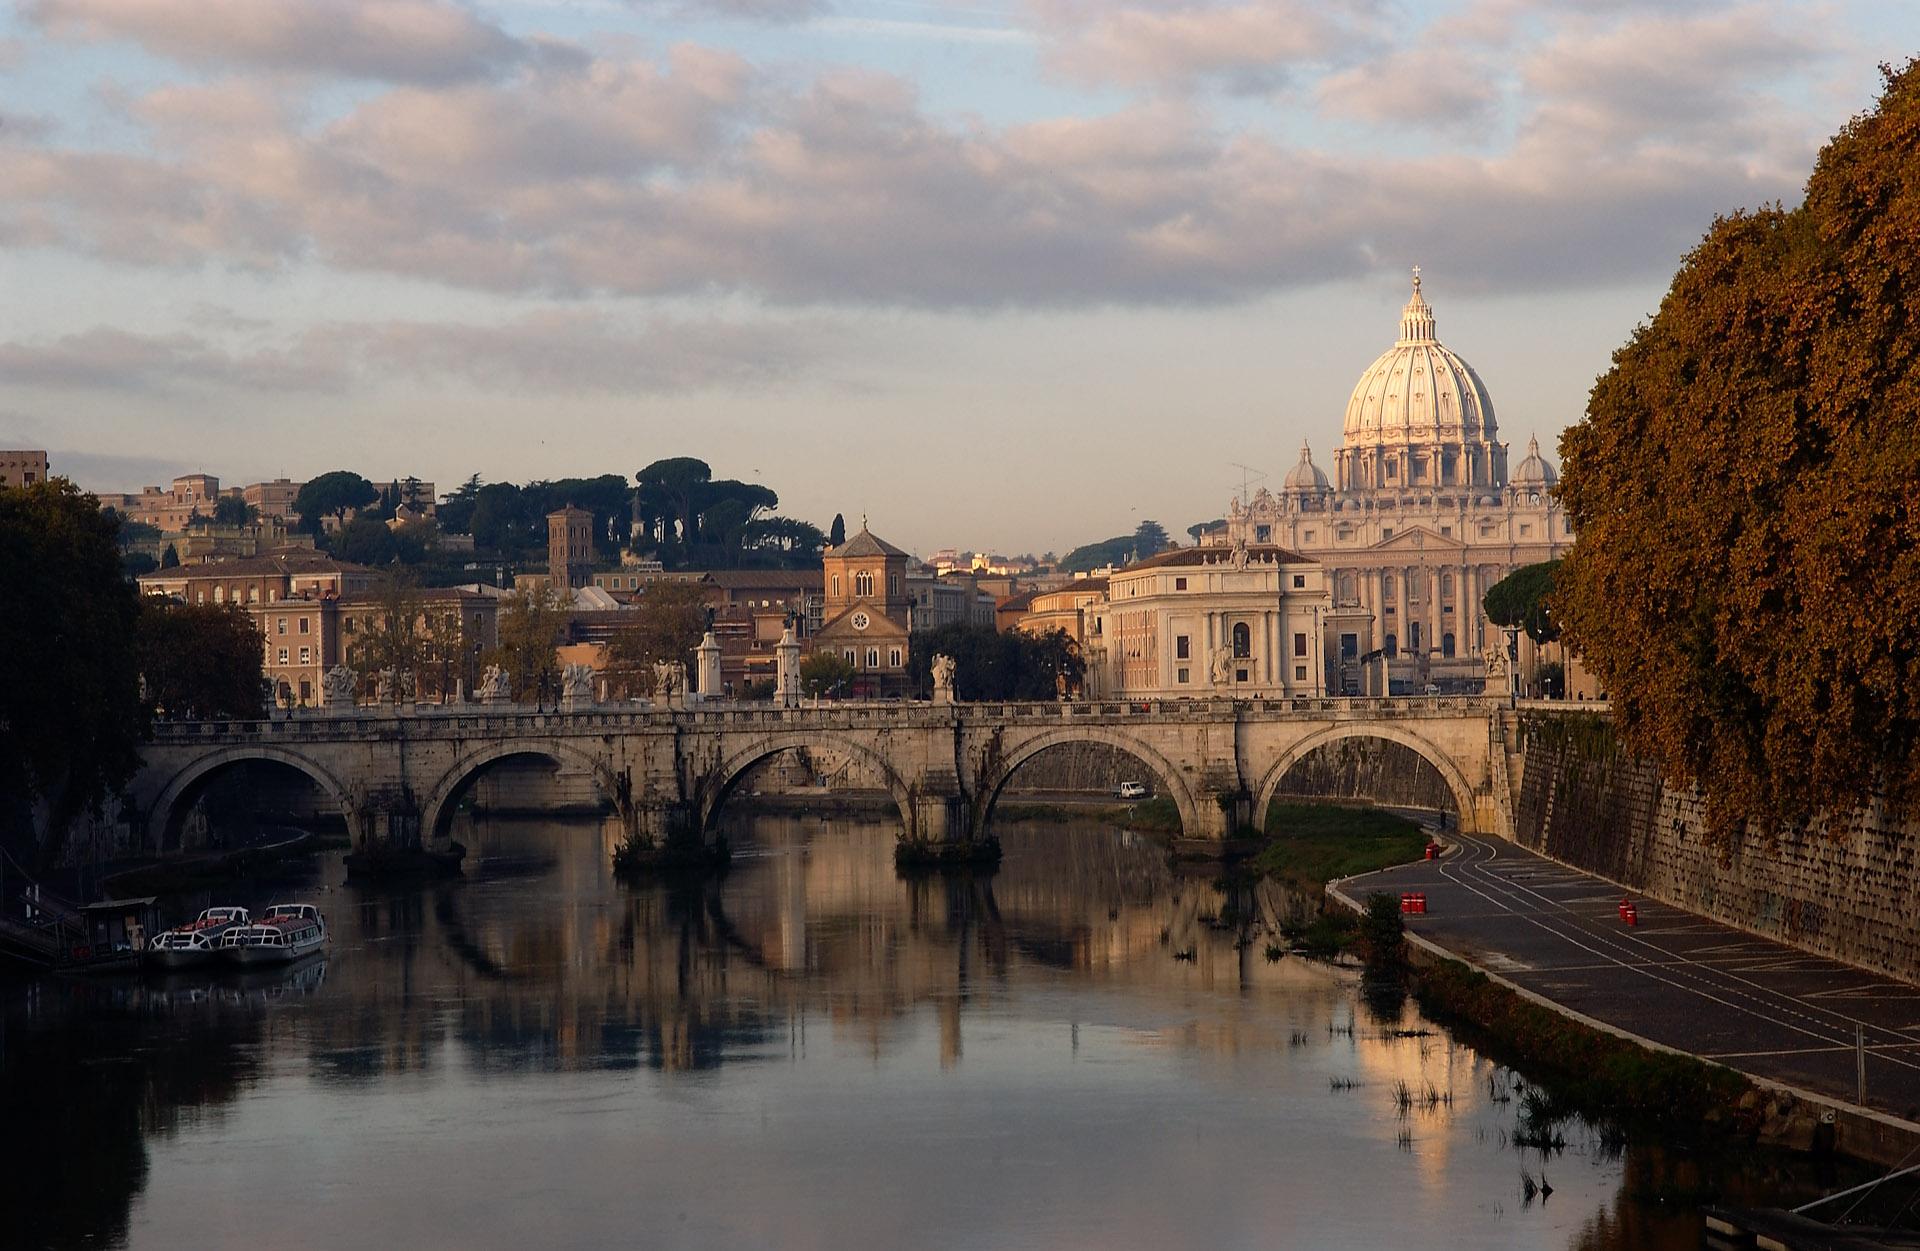 ROMA. Vaticano. Basílica de San Pedro.